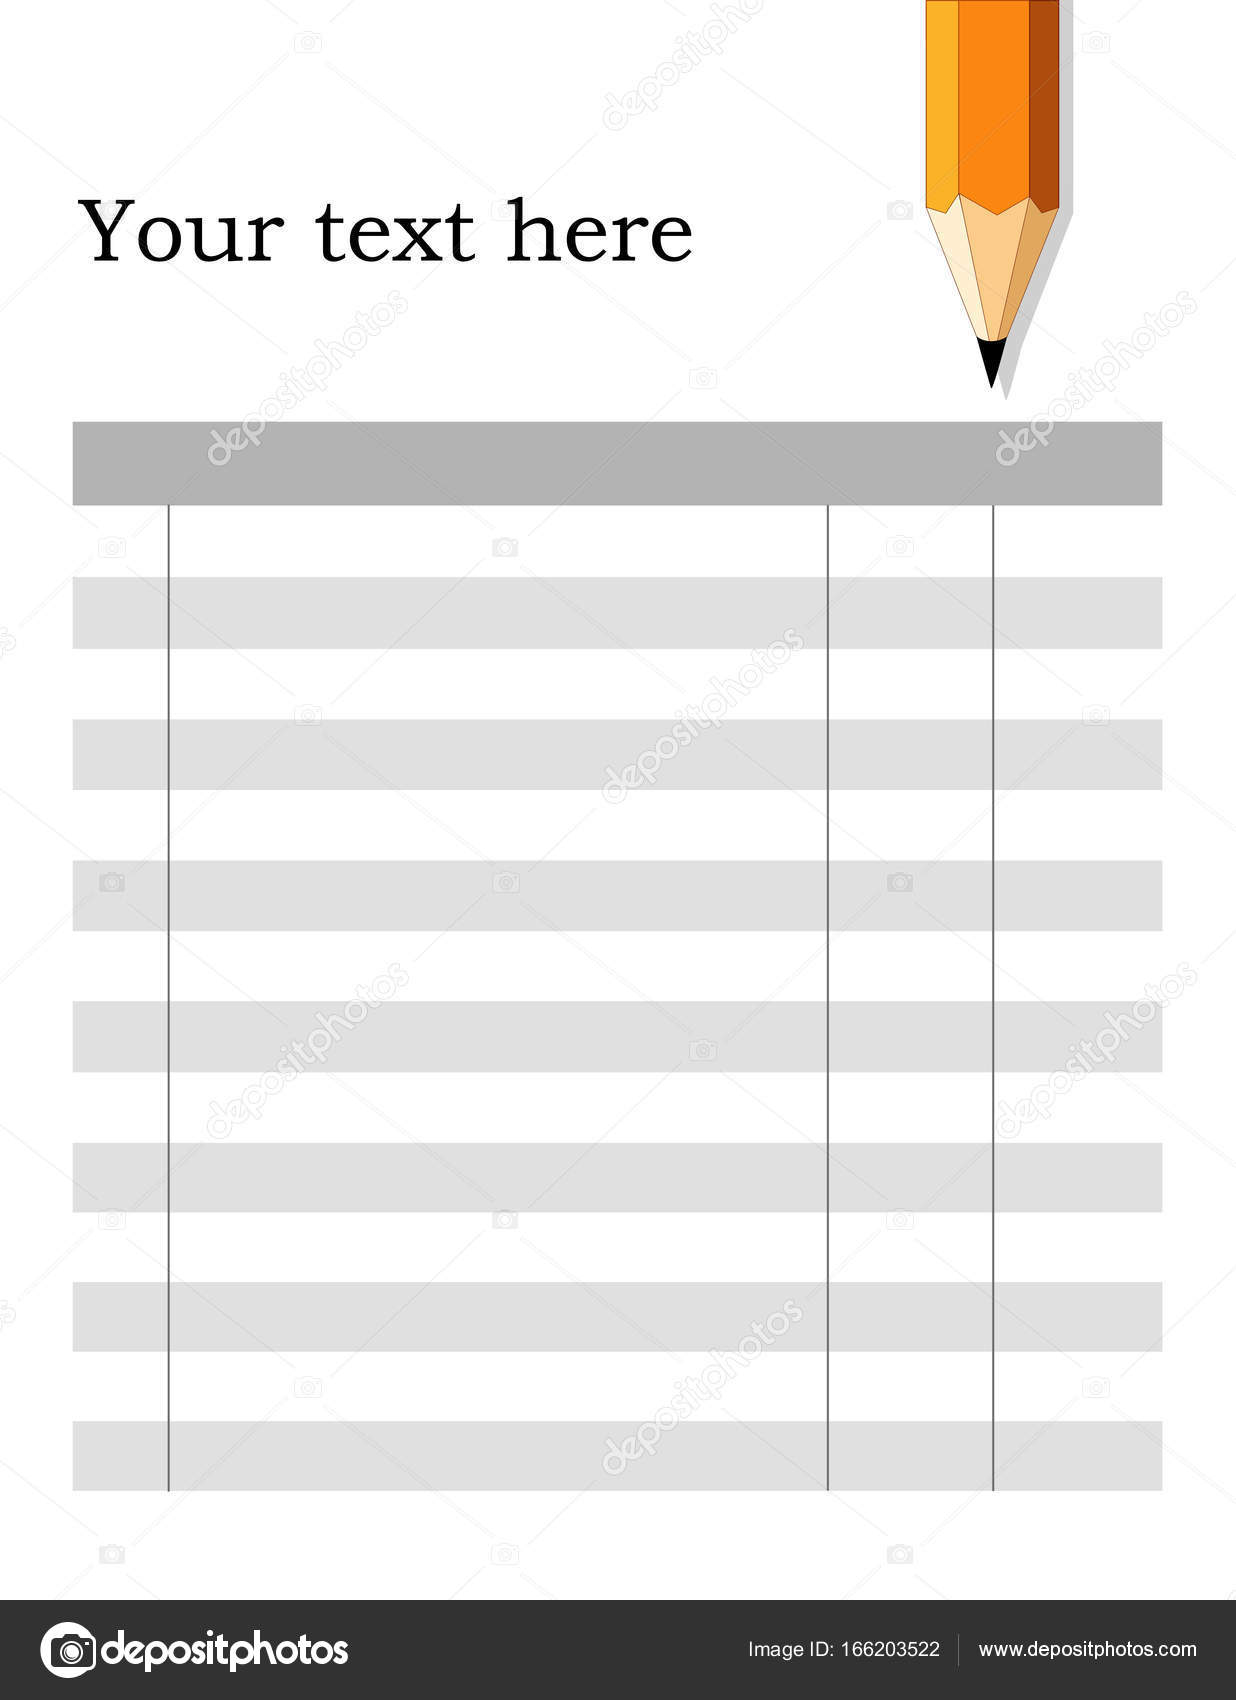 Invoice Form Checklist, Fill in the Blanks, Pencil \u2014 Stock Vector